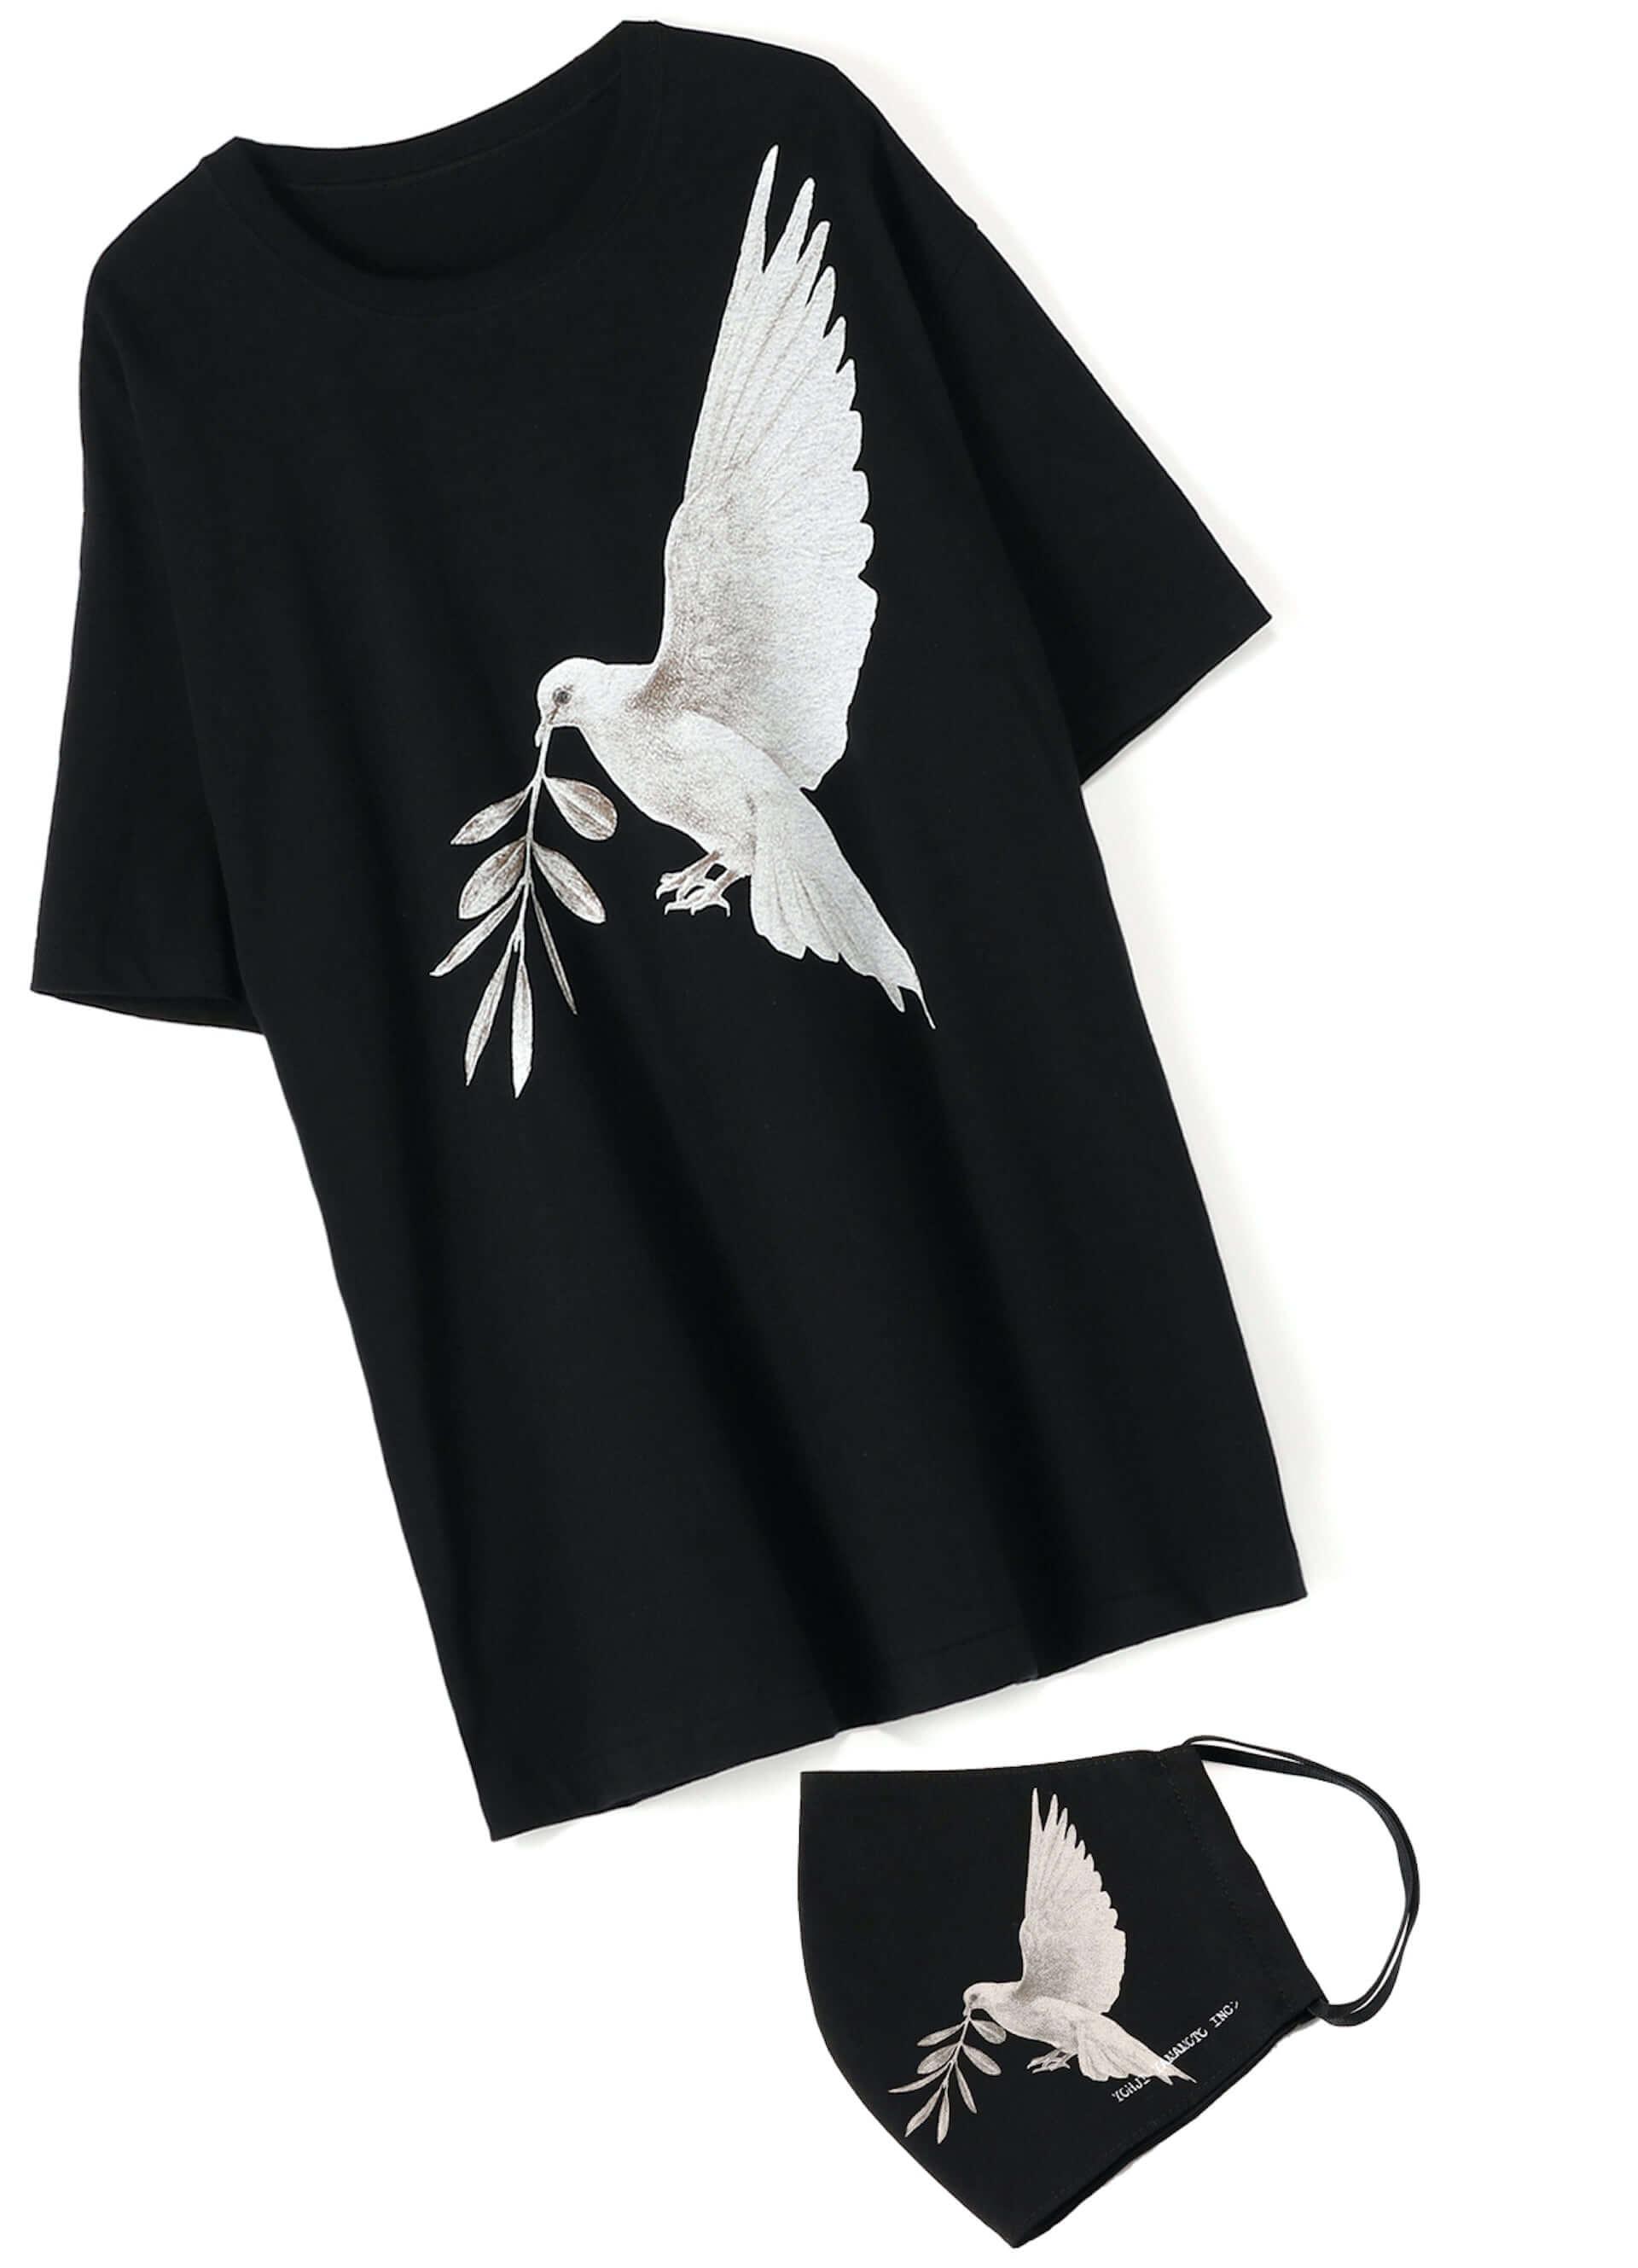 YOHJI YAMAMOTO +NOIRと画家 内田すずめがコラボした「Tシャツ+マスク」が限定販売!鳩や手の平のモチーフ3型 lf200604_yohjiyamamoto_01-1920x2658